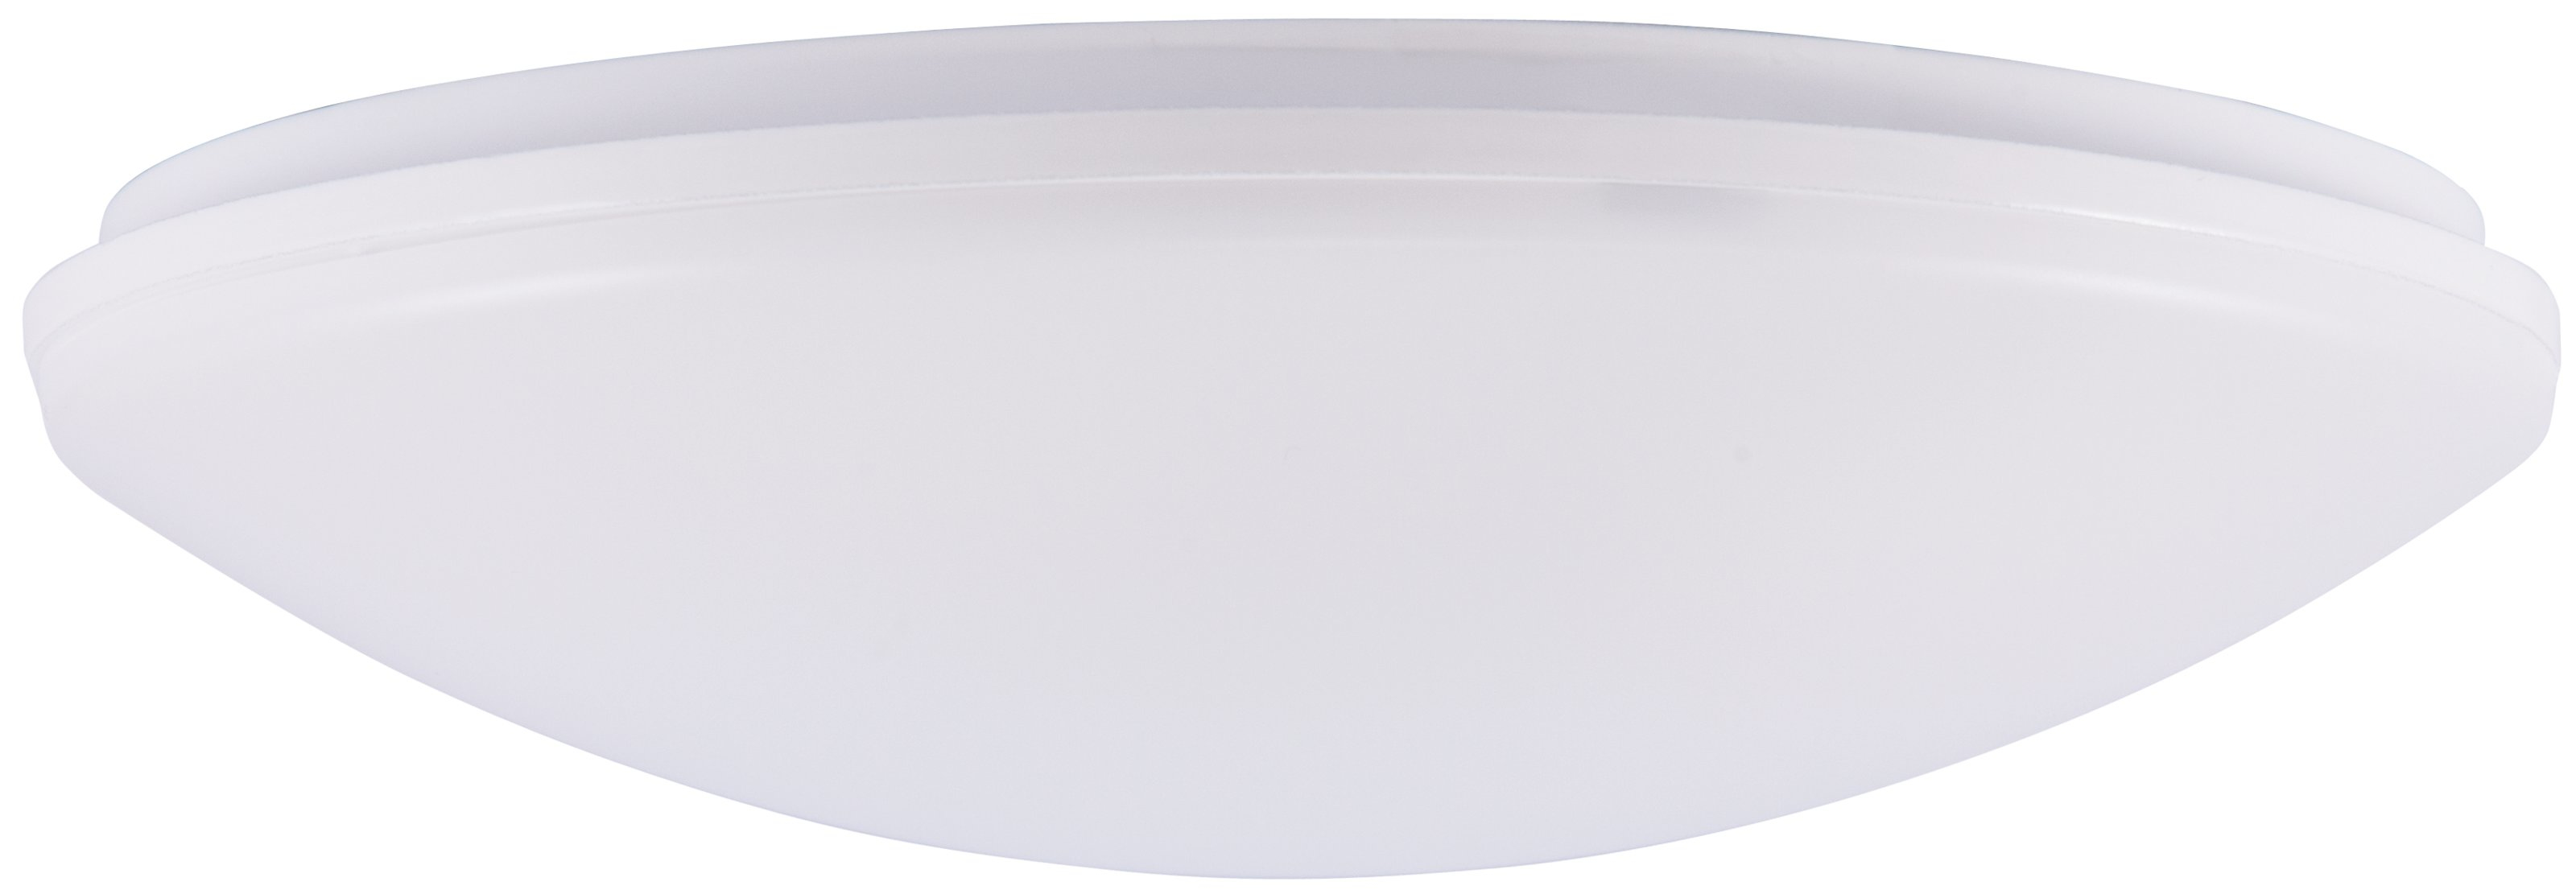 Telestar iWD 24 - 1 Glühbirne(n) - LED - 2700 K - 1400 lm - IP20 - Weiß